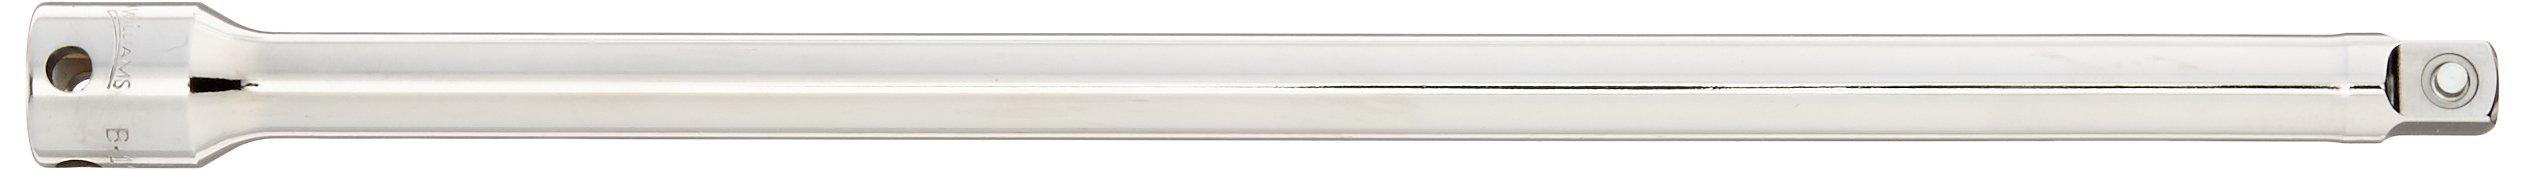 Williams B-115-TH 3/8 Drive Extension, 10.5''